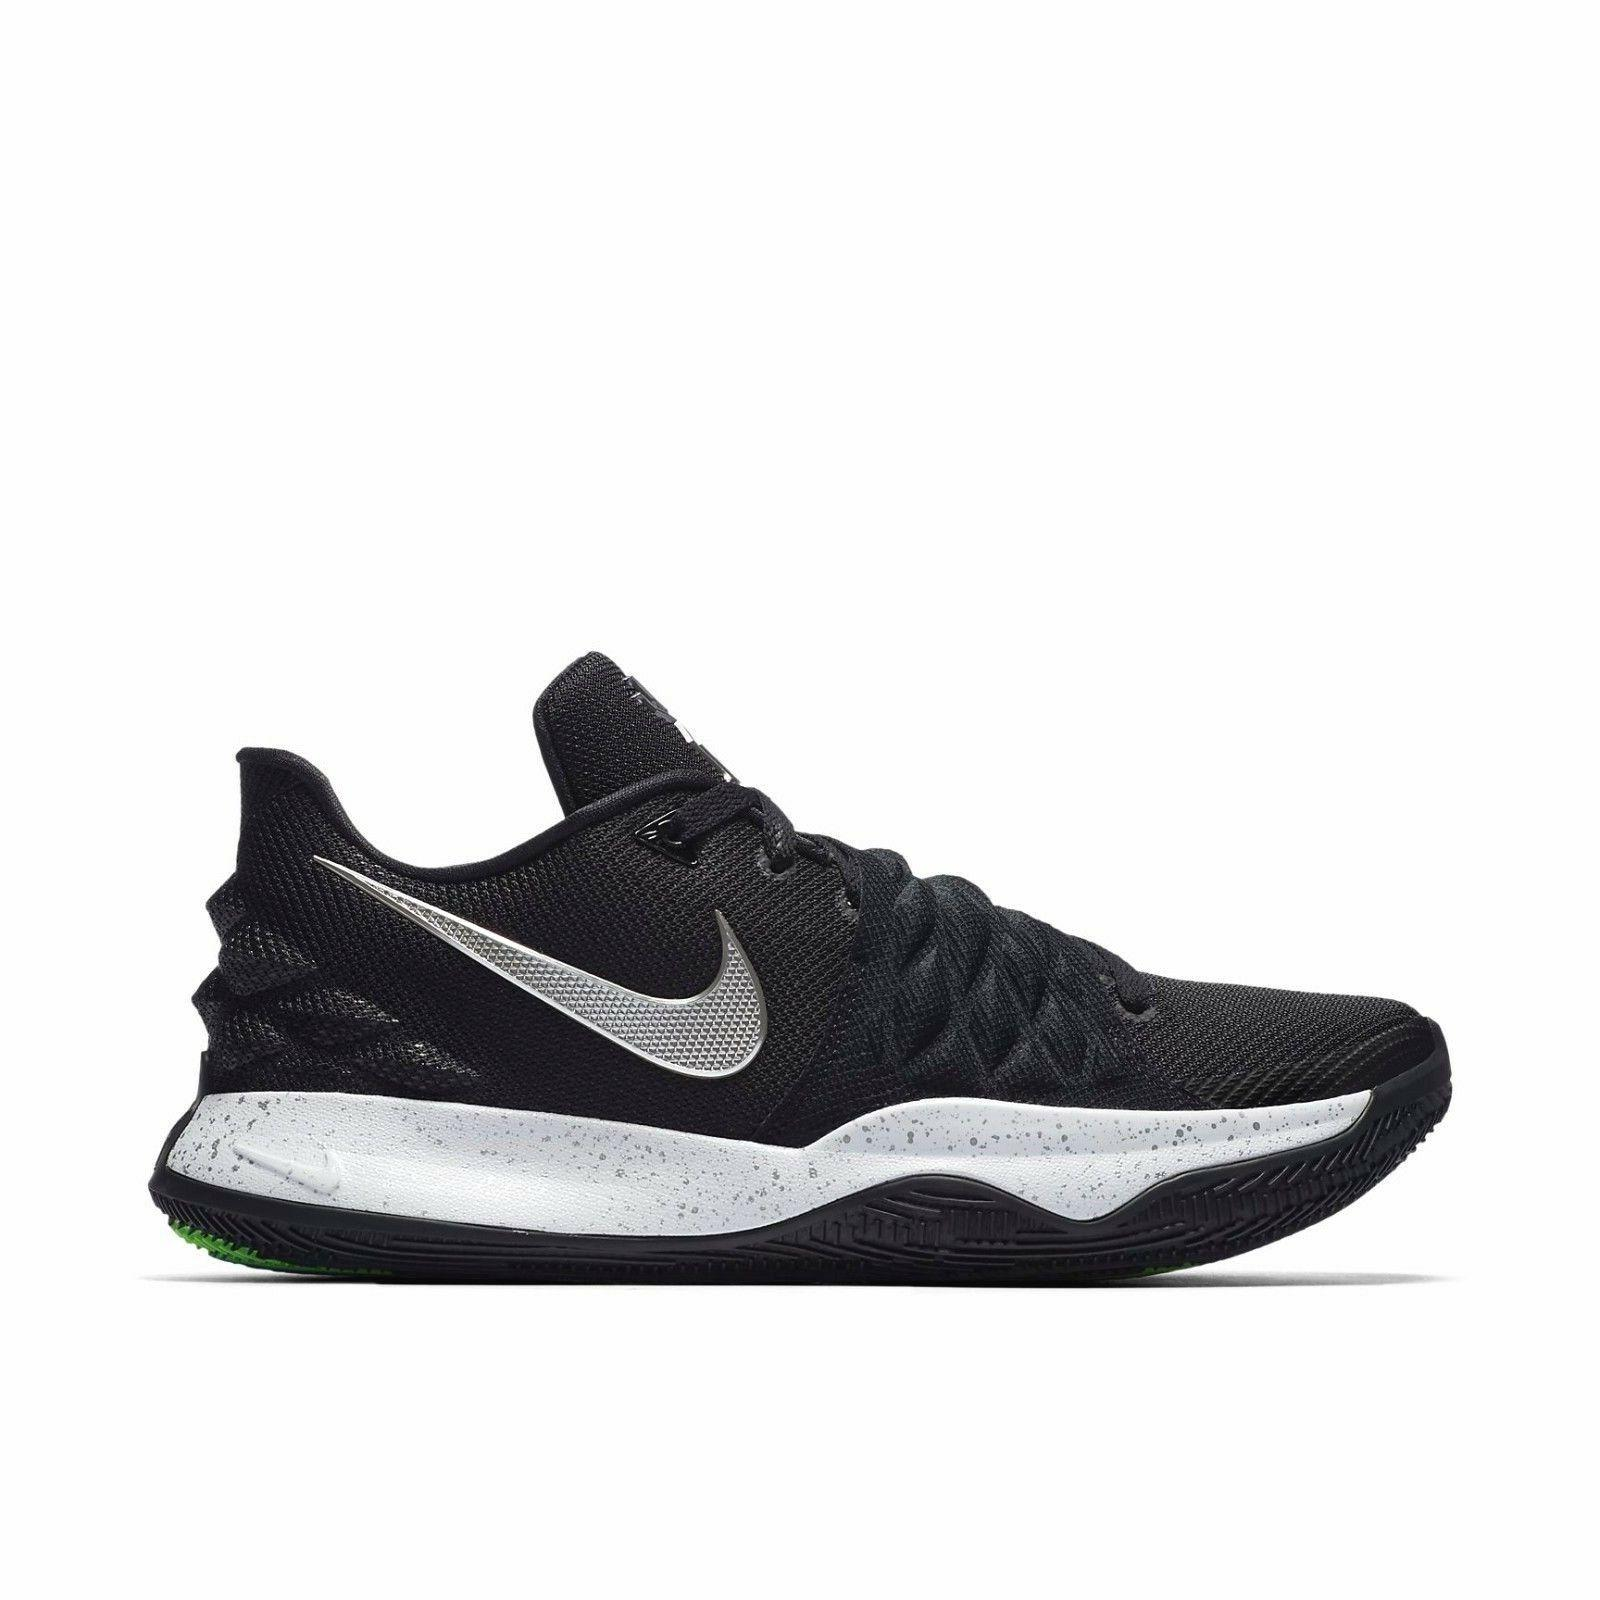 Nike Basketball Shoes 10.5 Black Metallic